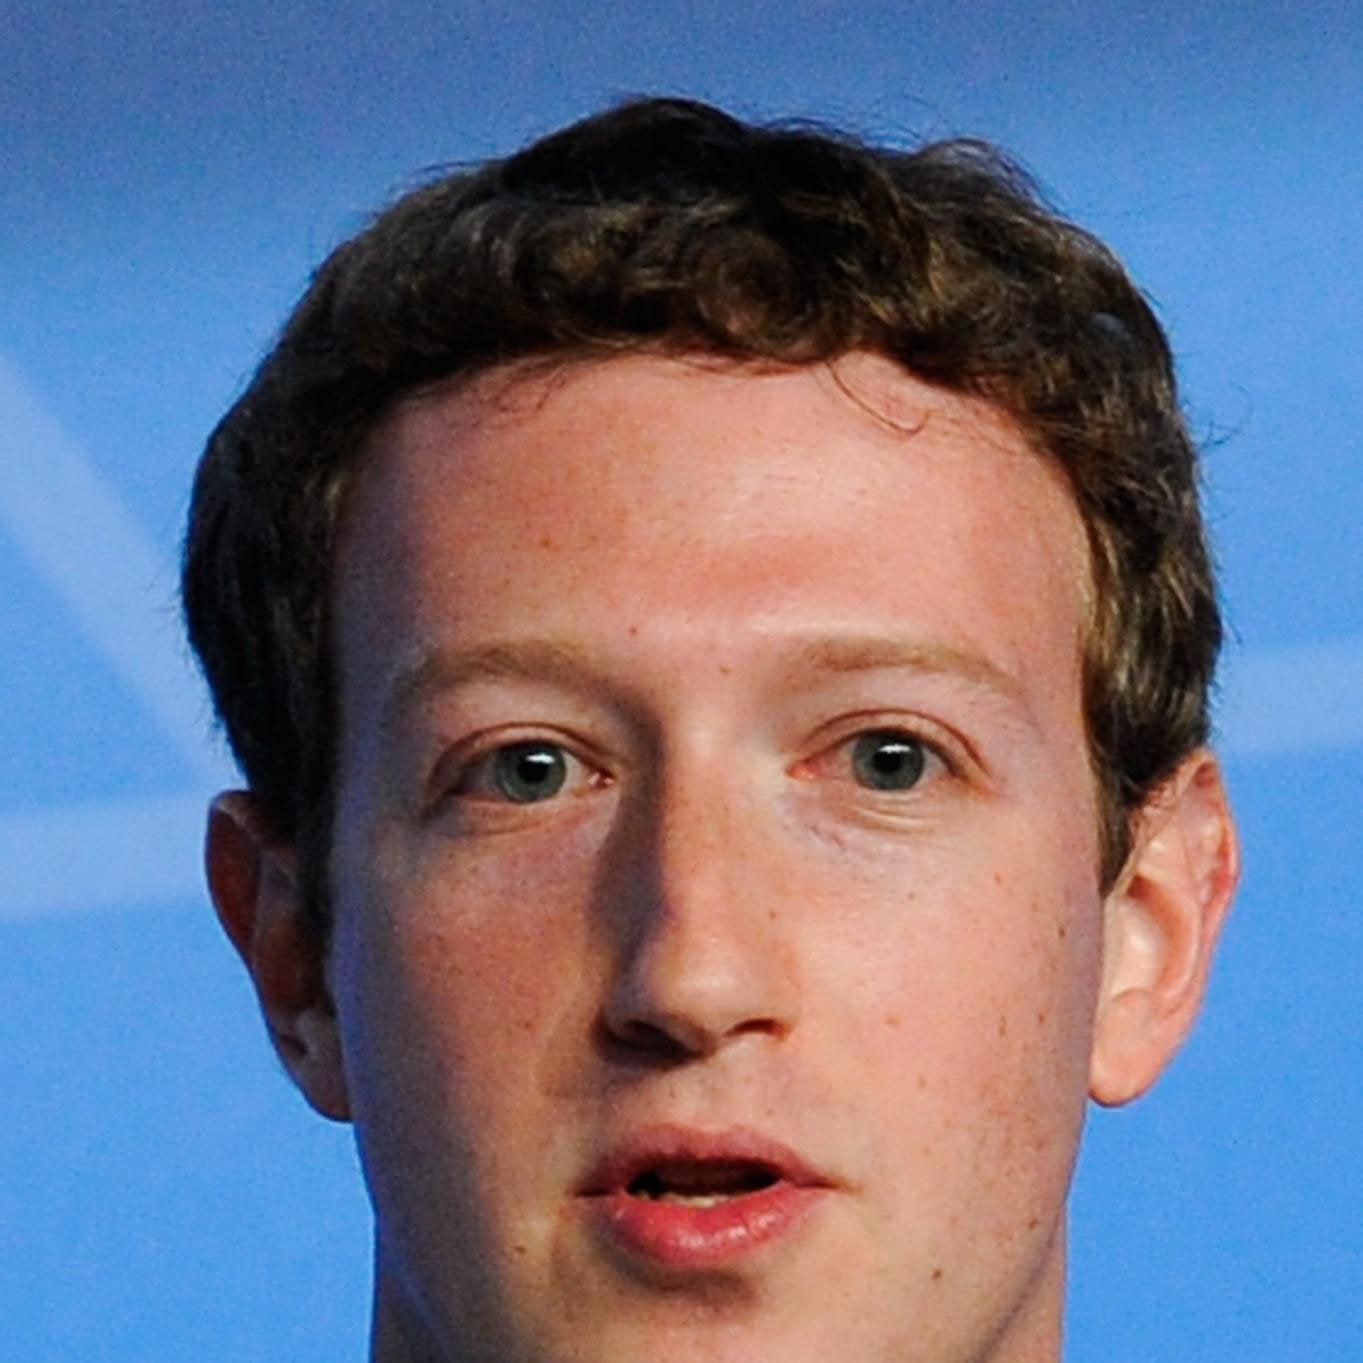 Mark Zuckerberg Says Facebook Employees Have Been Defacing 'Black Lives Matter' Slogans on Company Walls